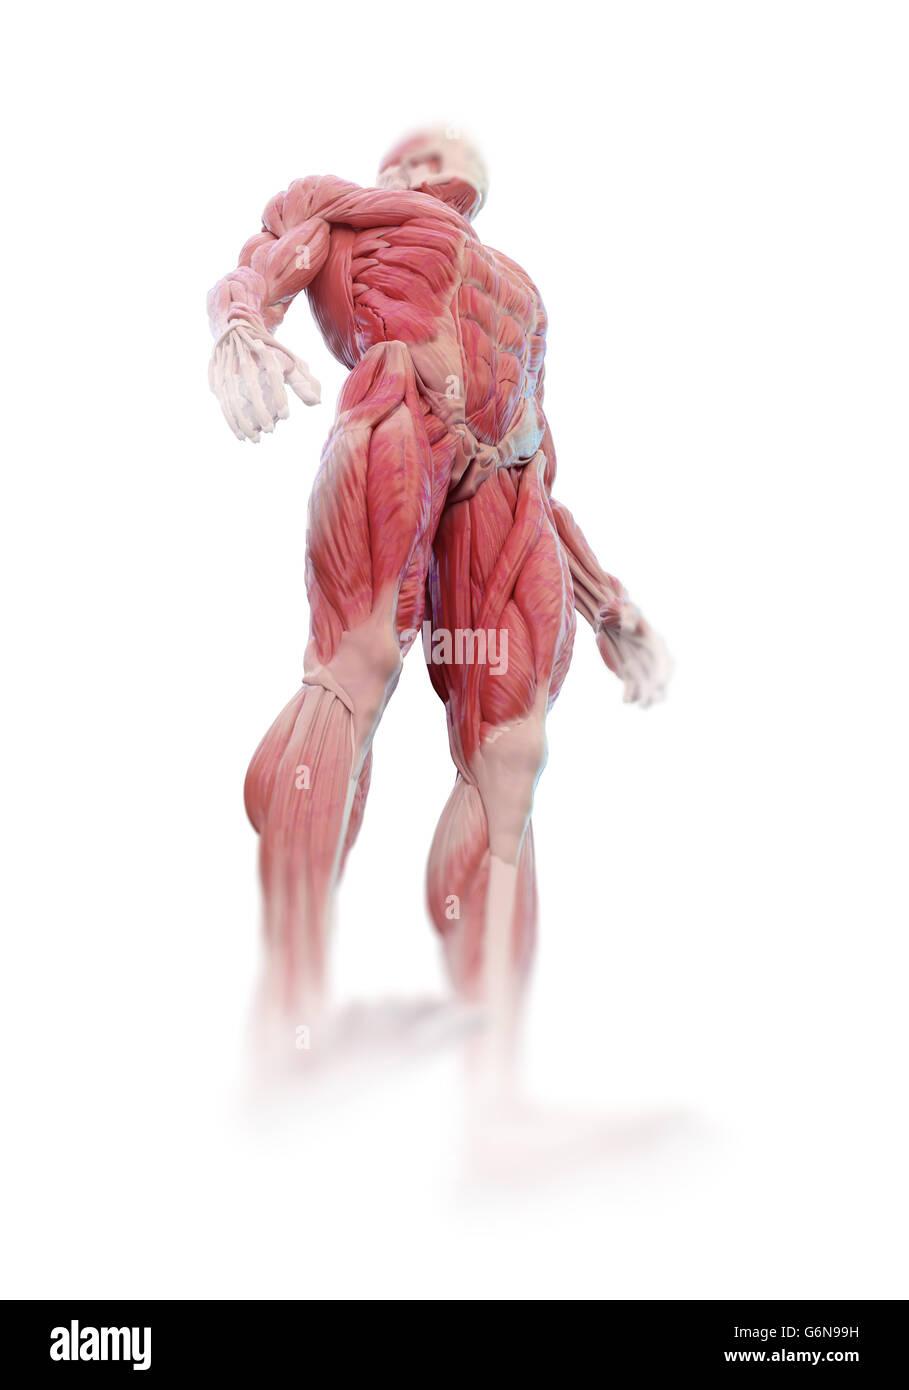 Detailed Muscle Human Anatomy Illustration Stock Photo 107418461